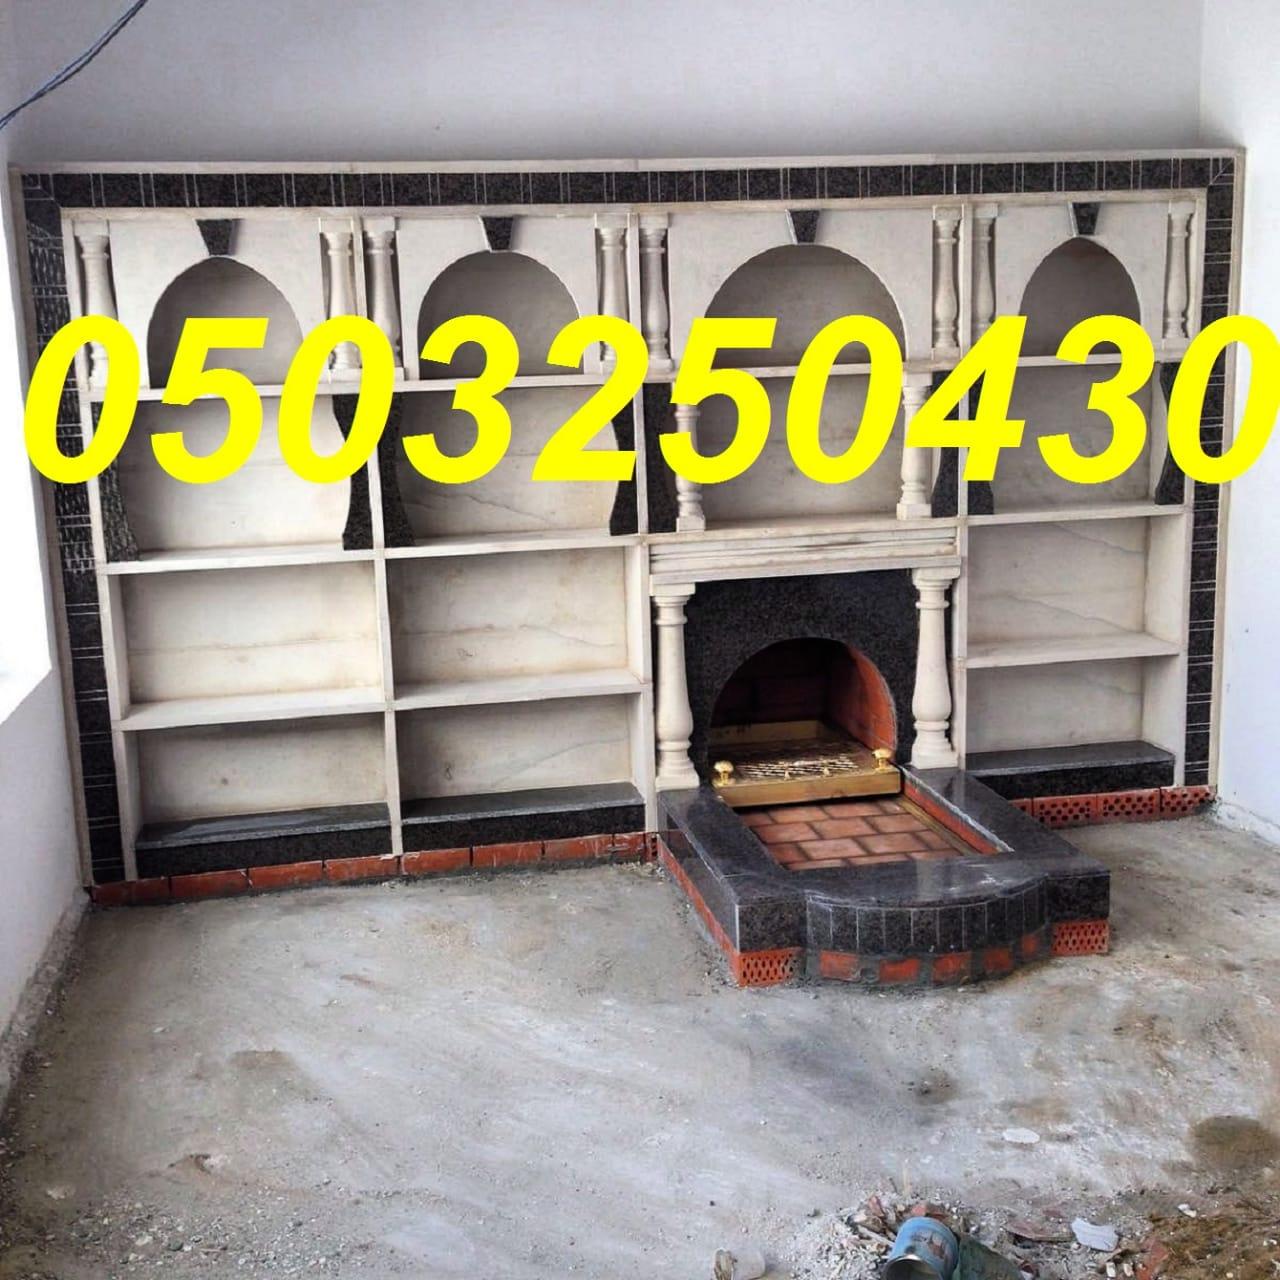 ديكورات 0503250430